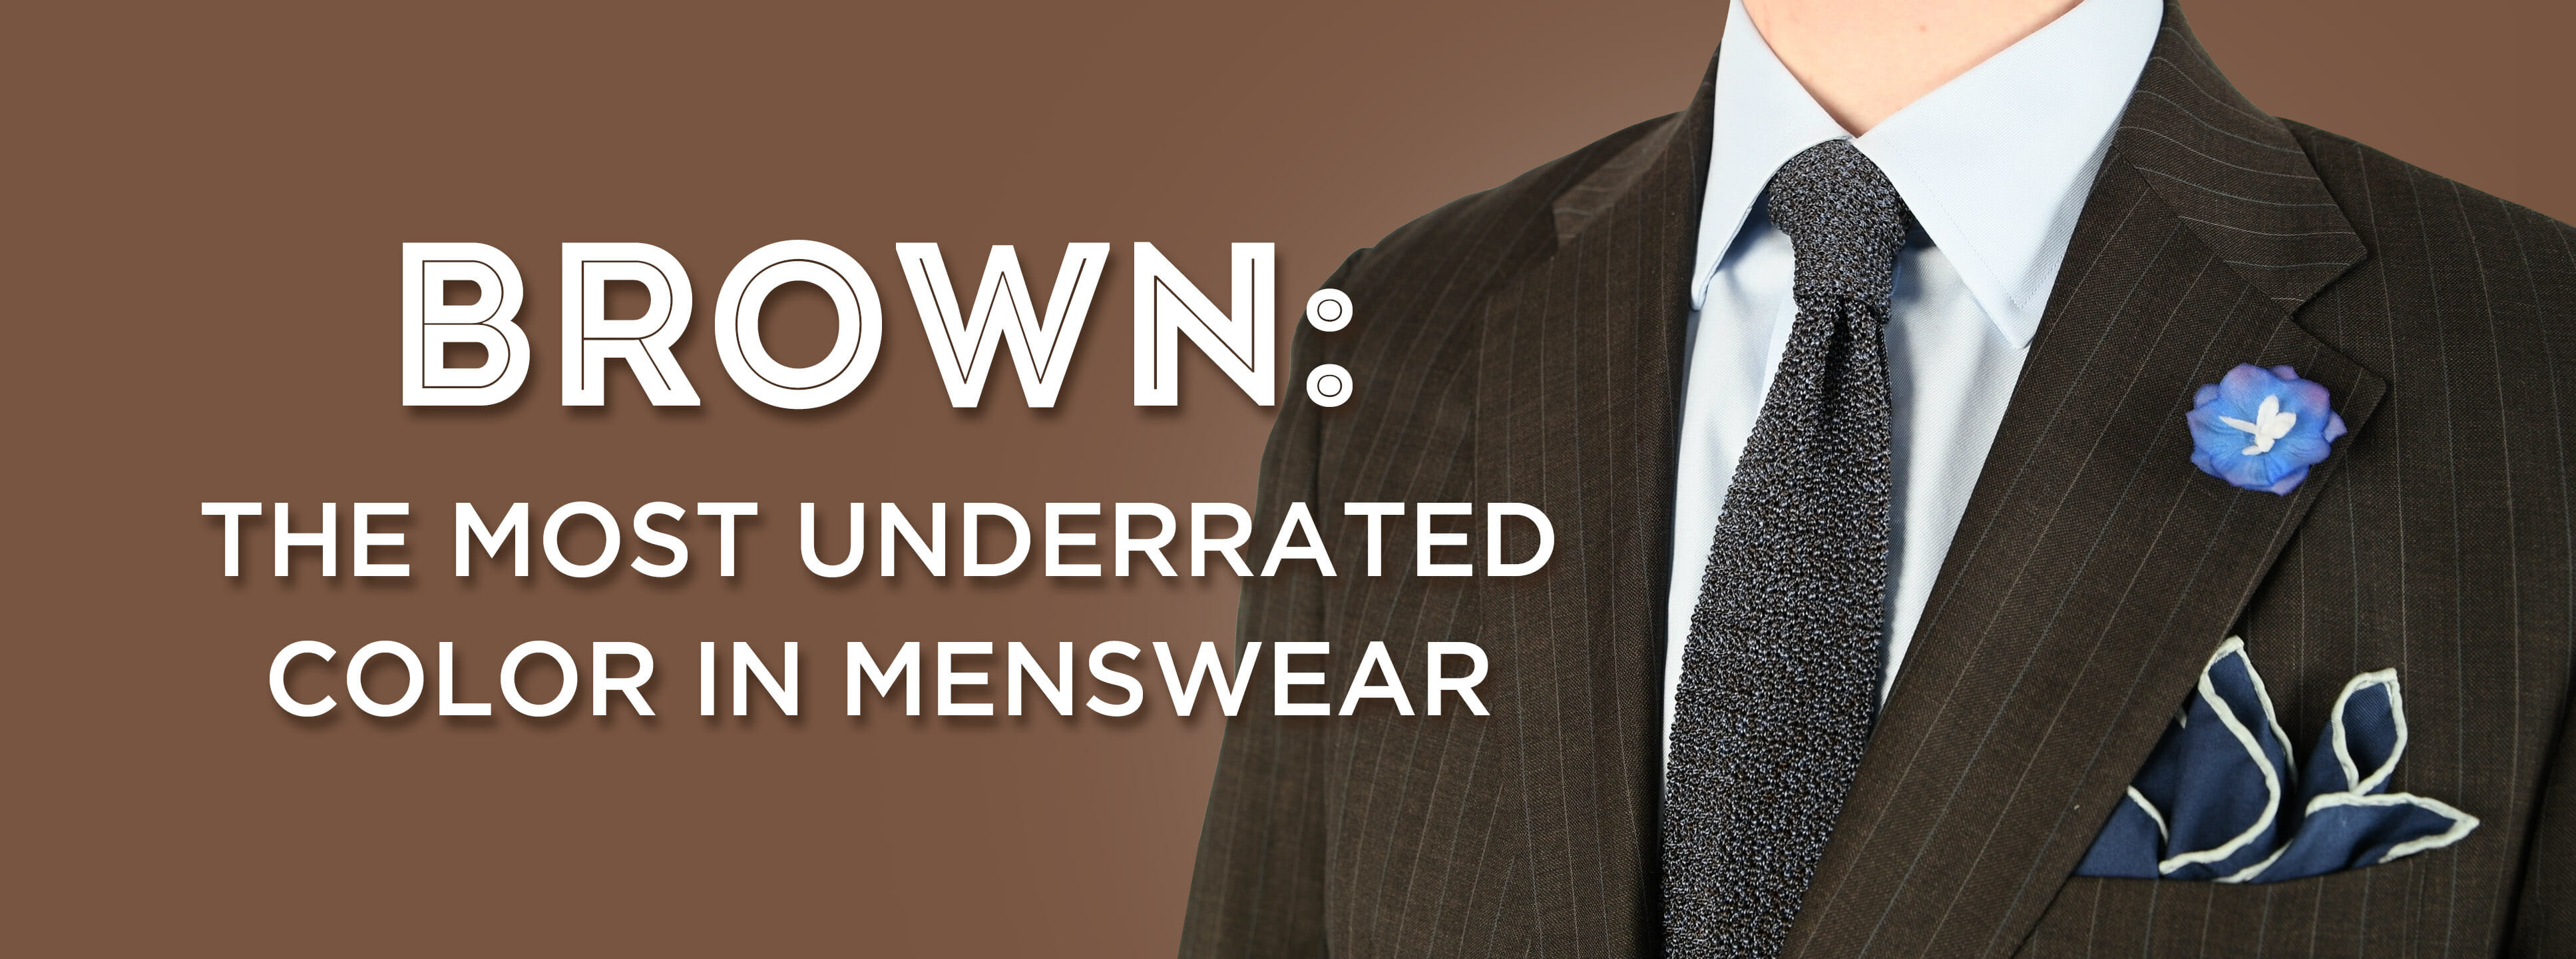 3a8f4e786ea0 Brown: The Most Underrated Color in Menswear — Gentleman's Gazette